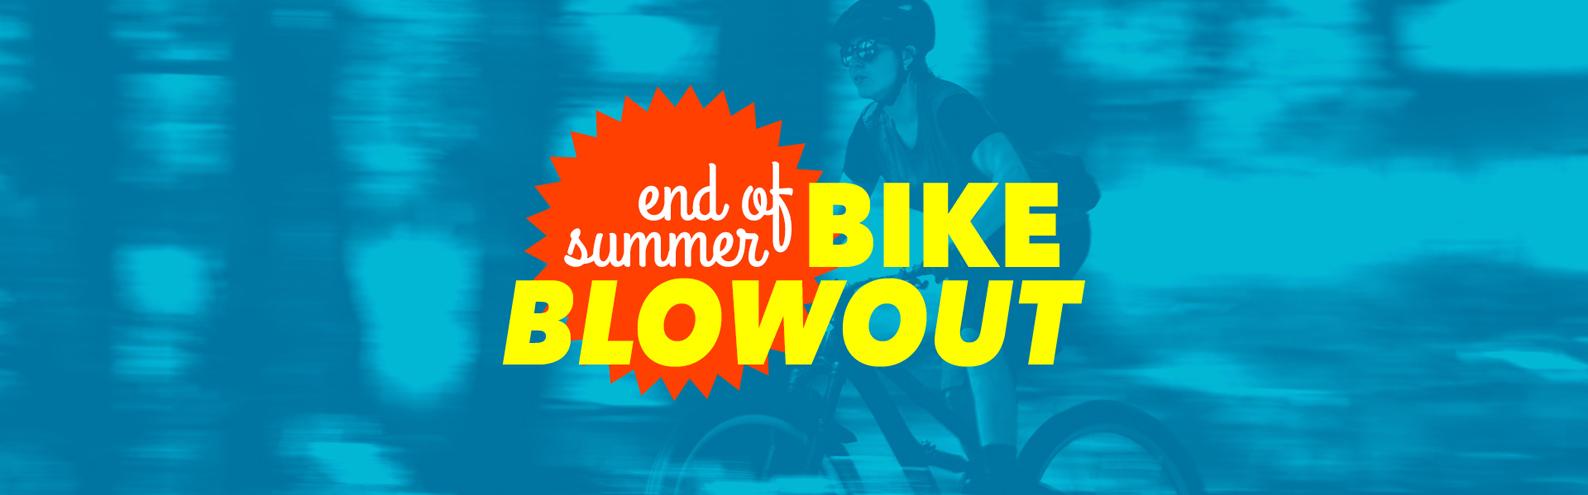 End of Summer Bike Blowout Sale